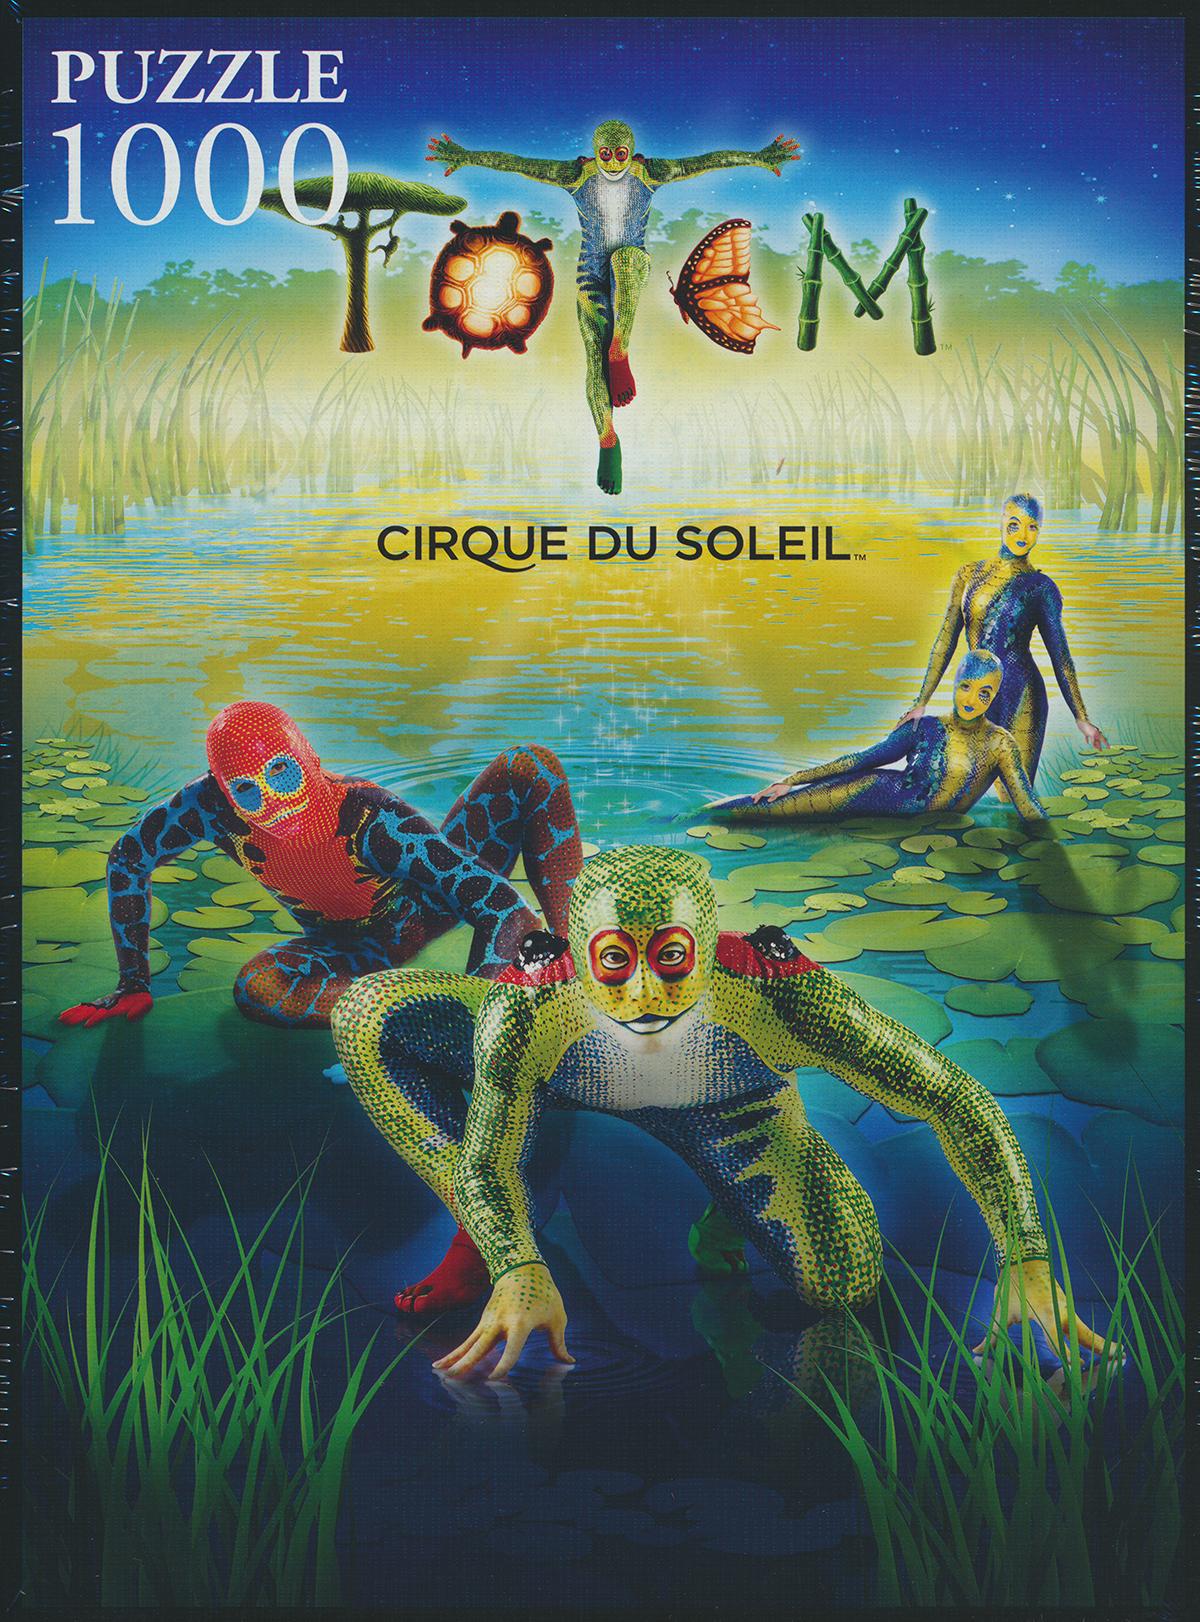 Trefl Jigsaw Puzzle 1000 Pieces totem, cirque de soleil circus puzzel totem-cirque-soleil